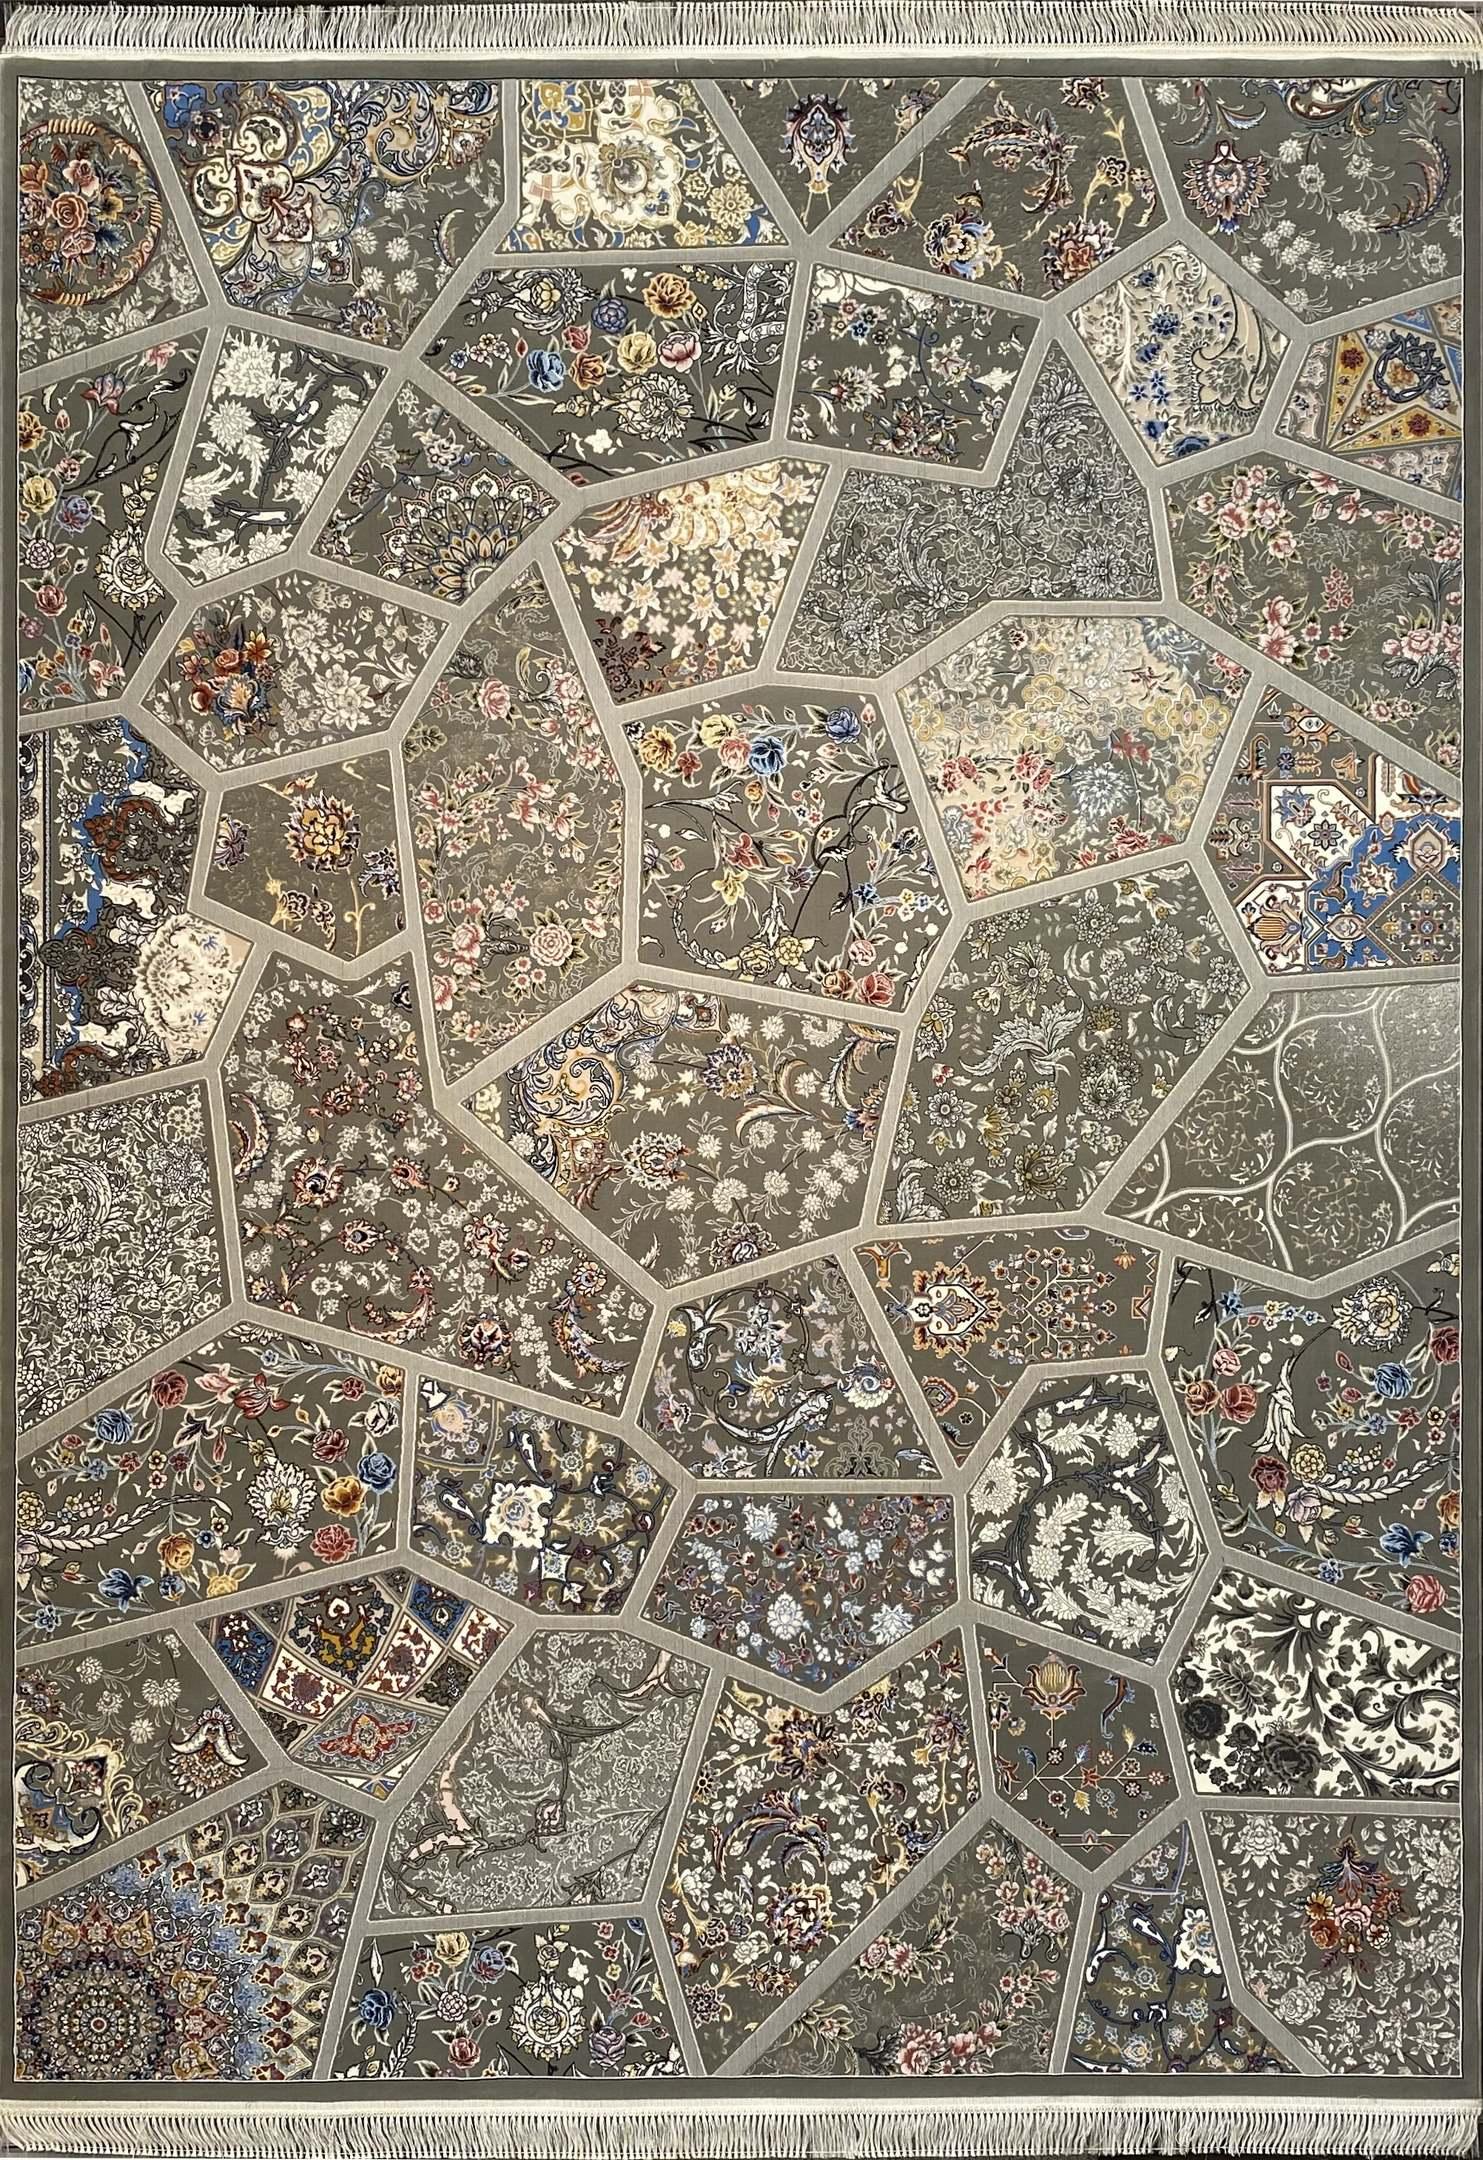 فرش کاشان -نقشه آینه  1000 شانه فیلی گلبرجسته